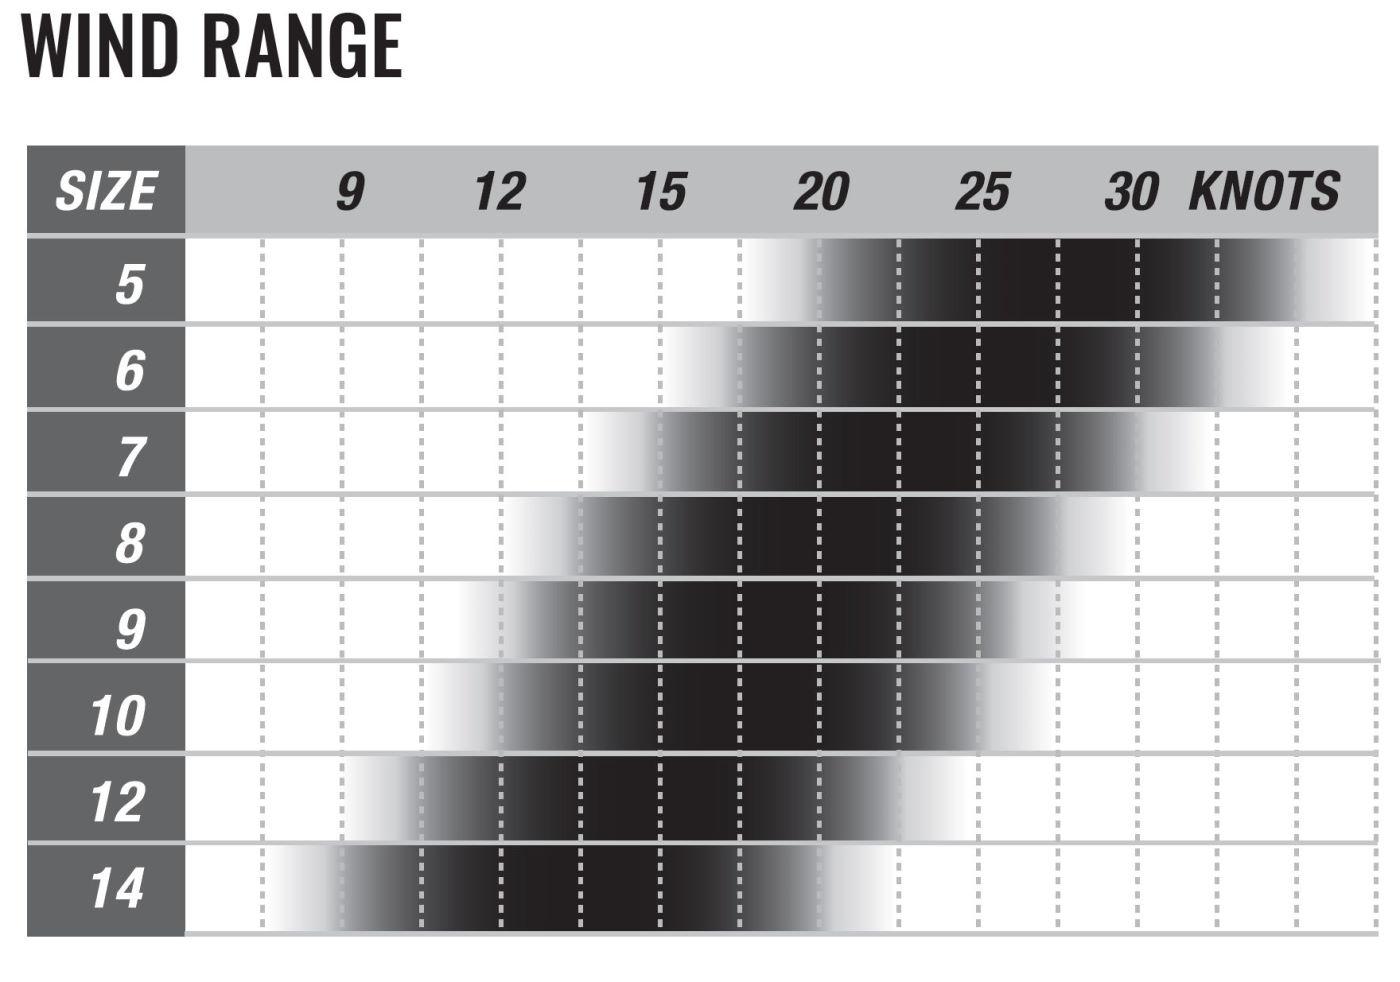 2020 Cabrinha FX Kiteboarding Kite wind range